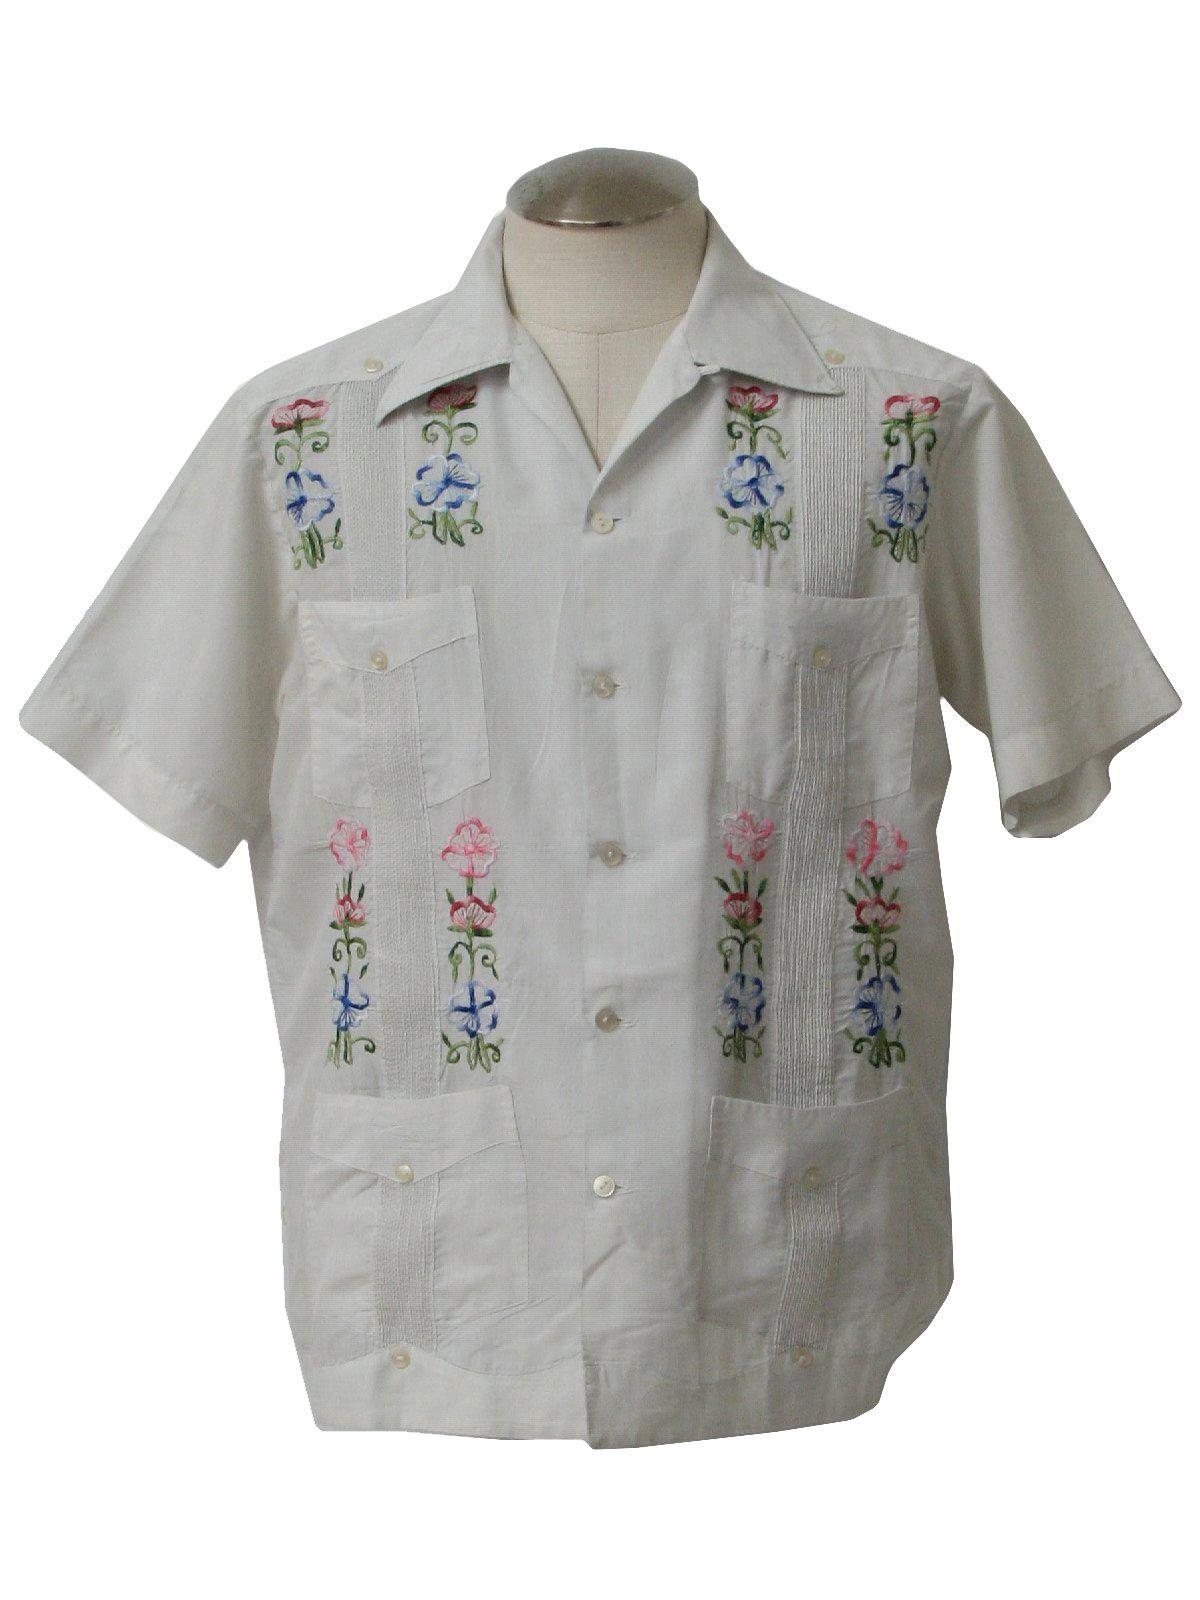 1970's Yucatan Mens Hippie Style Guayabera Shirt Mexican